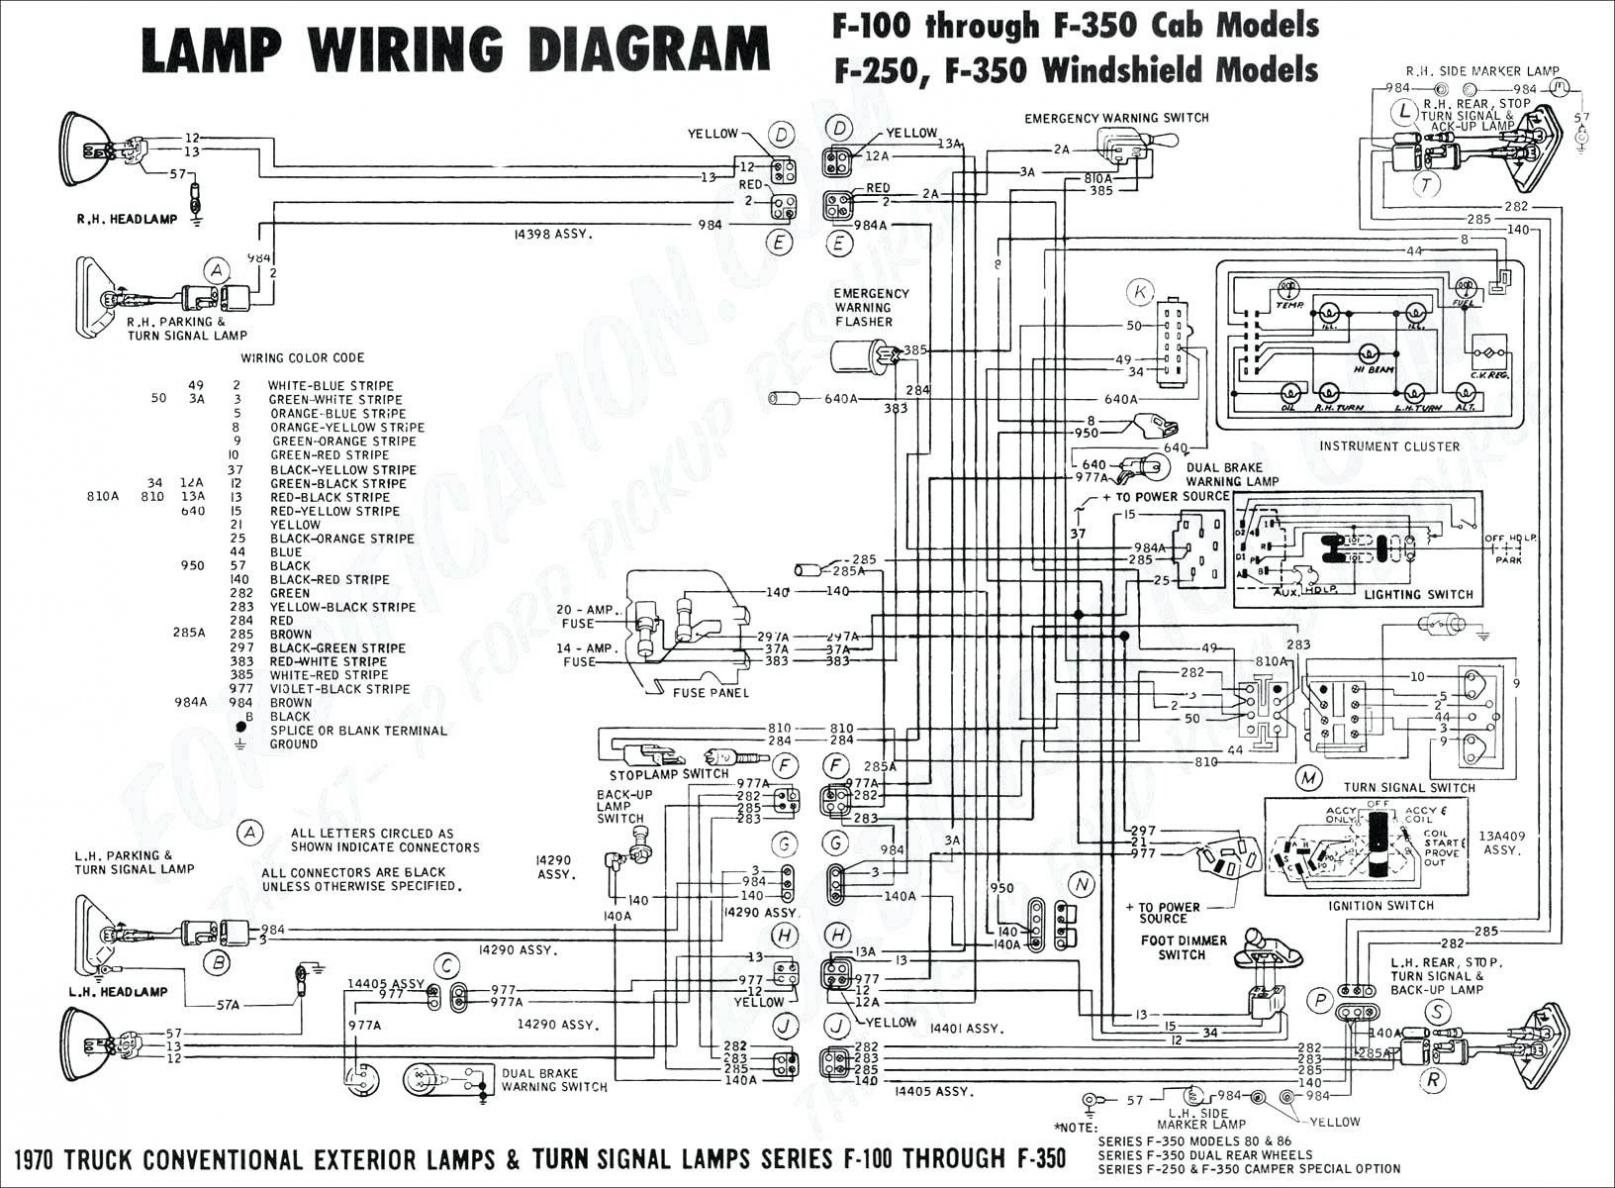 Wiring Diagram Western Unimount Save Western Unimount Wiring Diagram - Western Unimount Plow Wiring Diagram